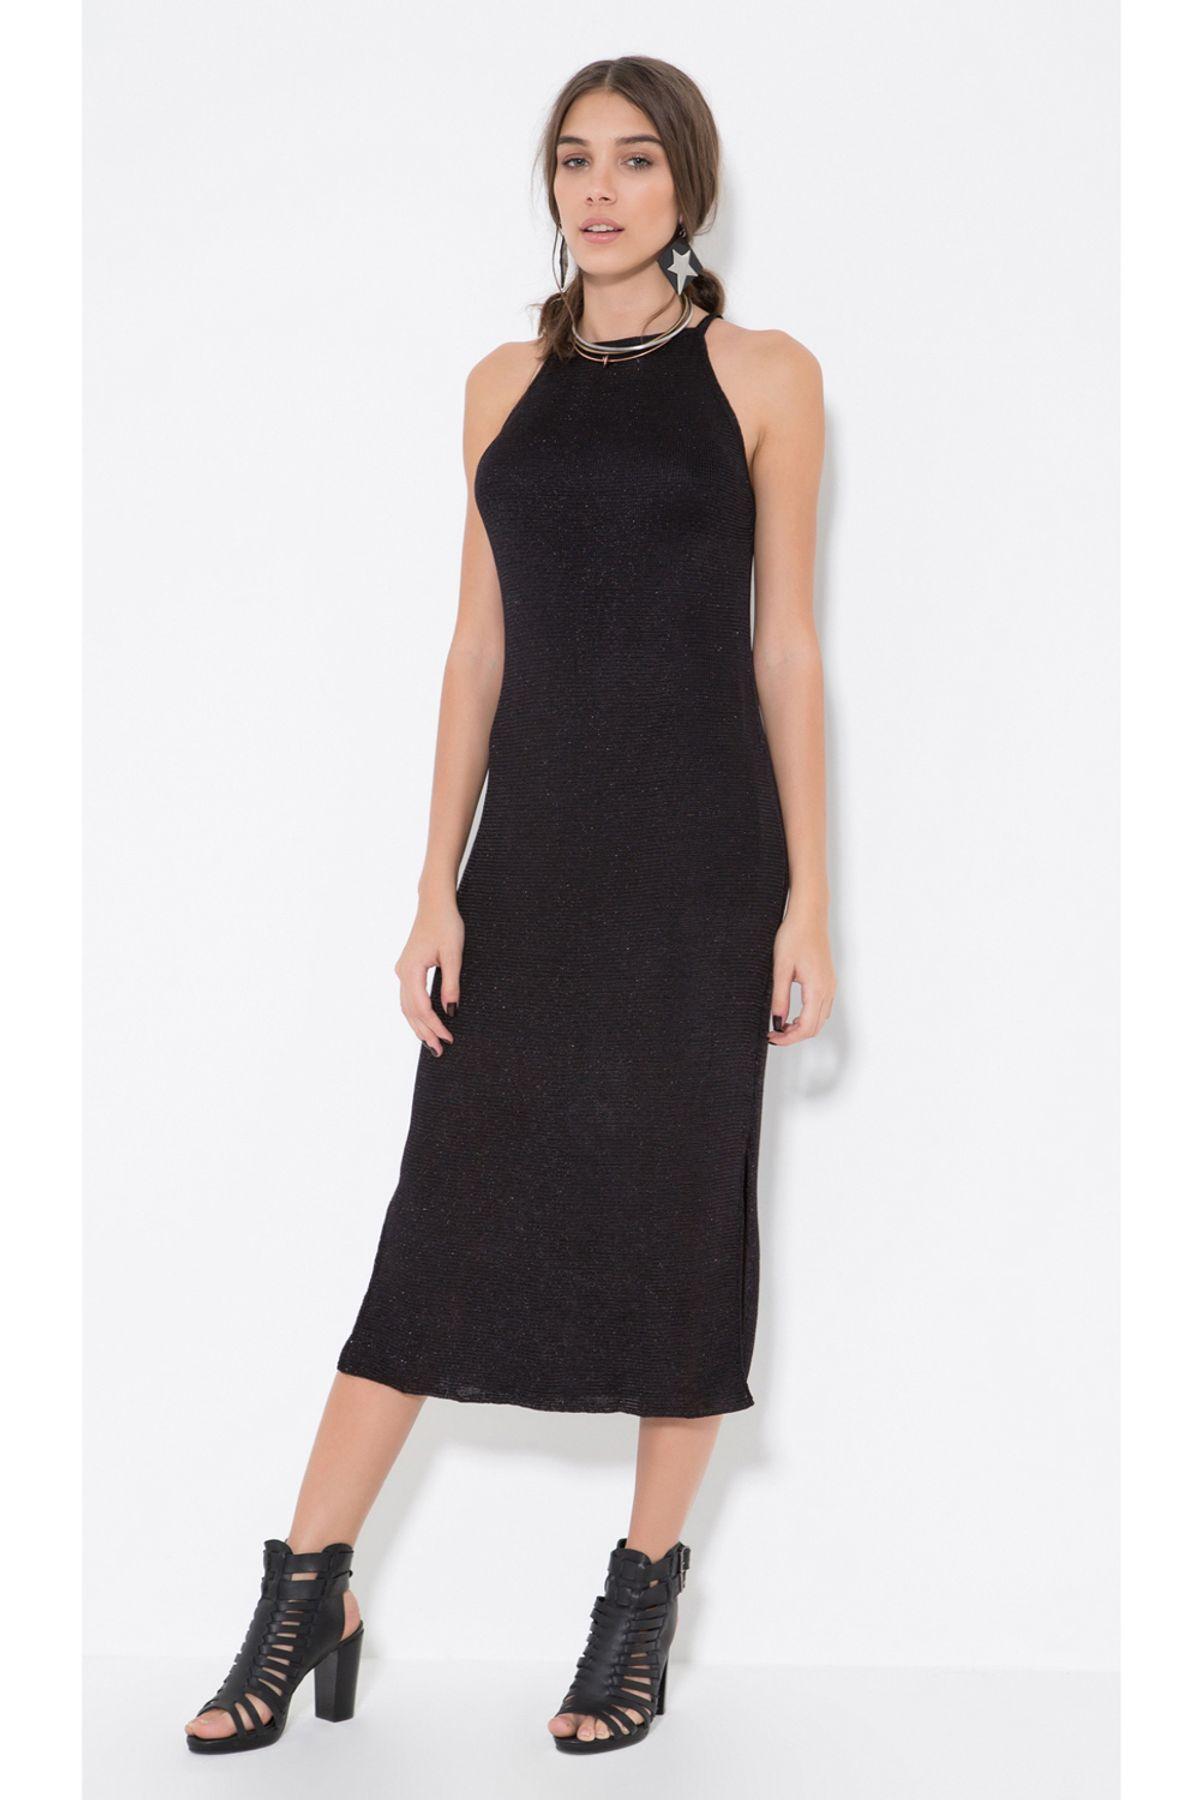 oh-boy-roupas-femininas-inverno17-look-92